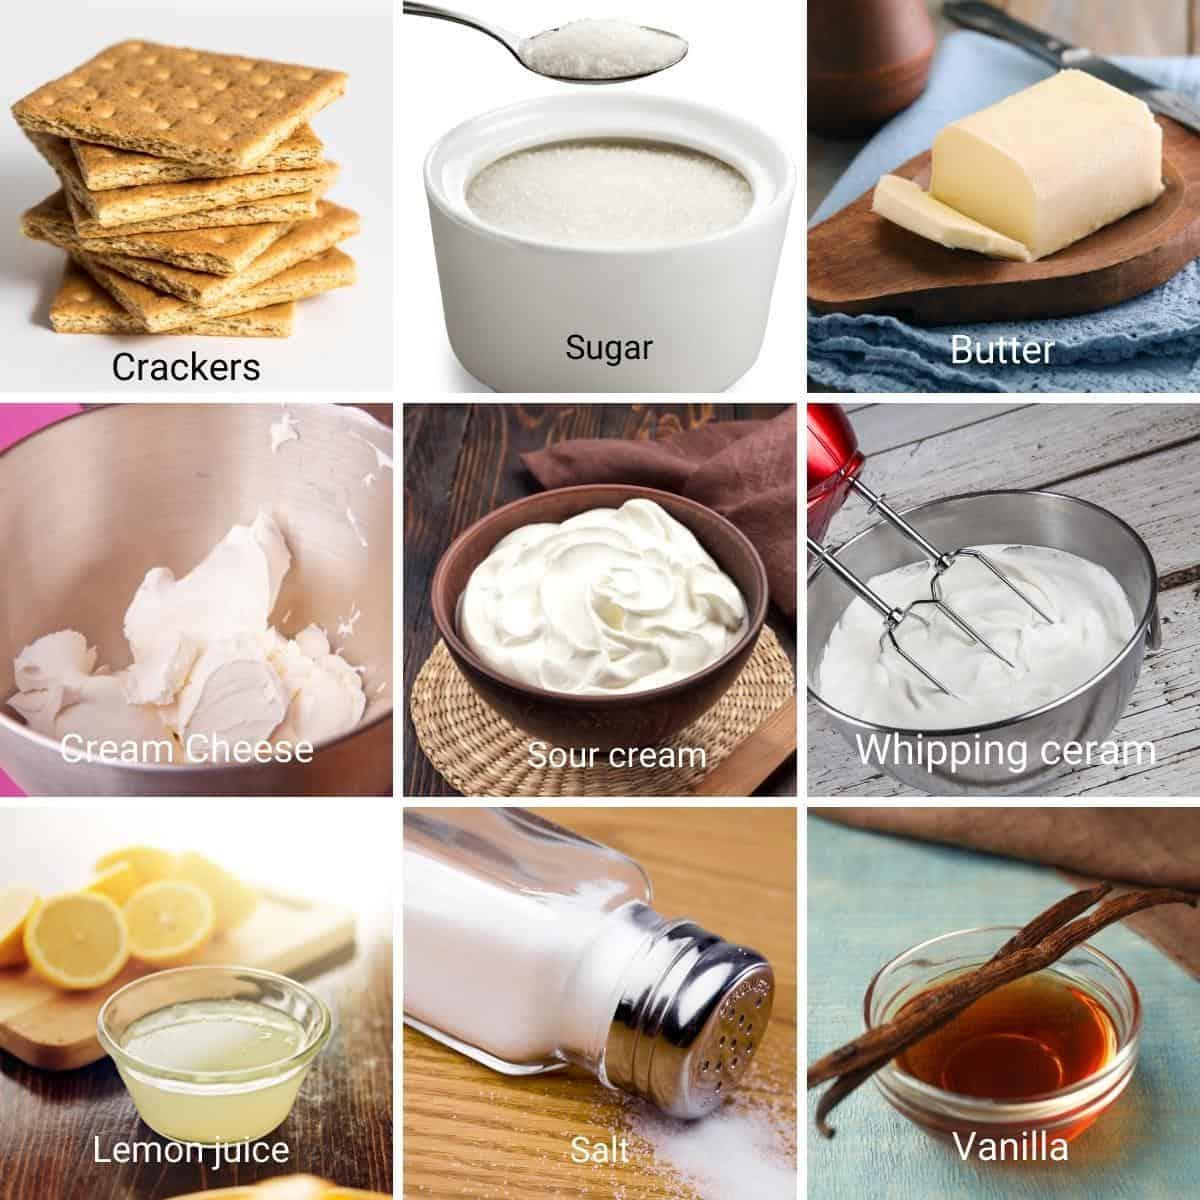 Ingredients shot collage for no bake cheesecake recipe.